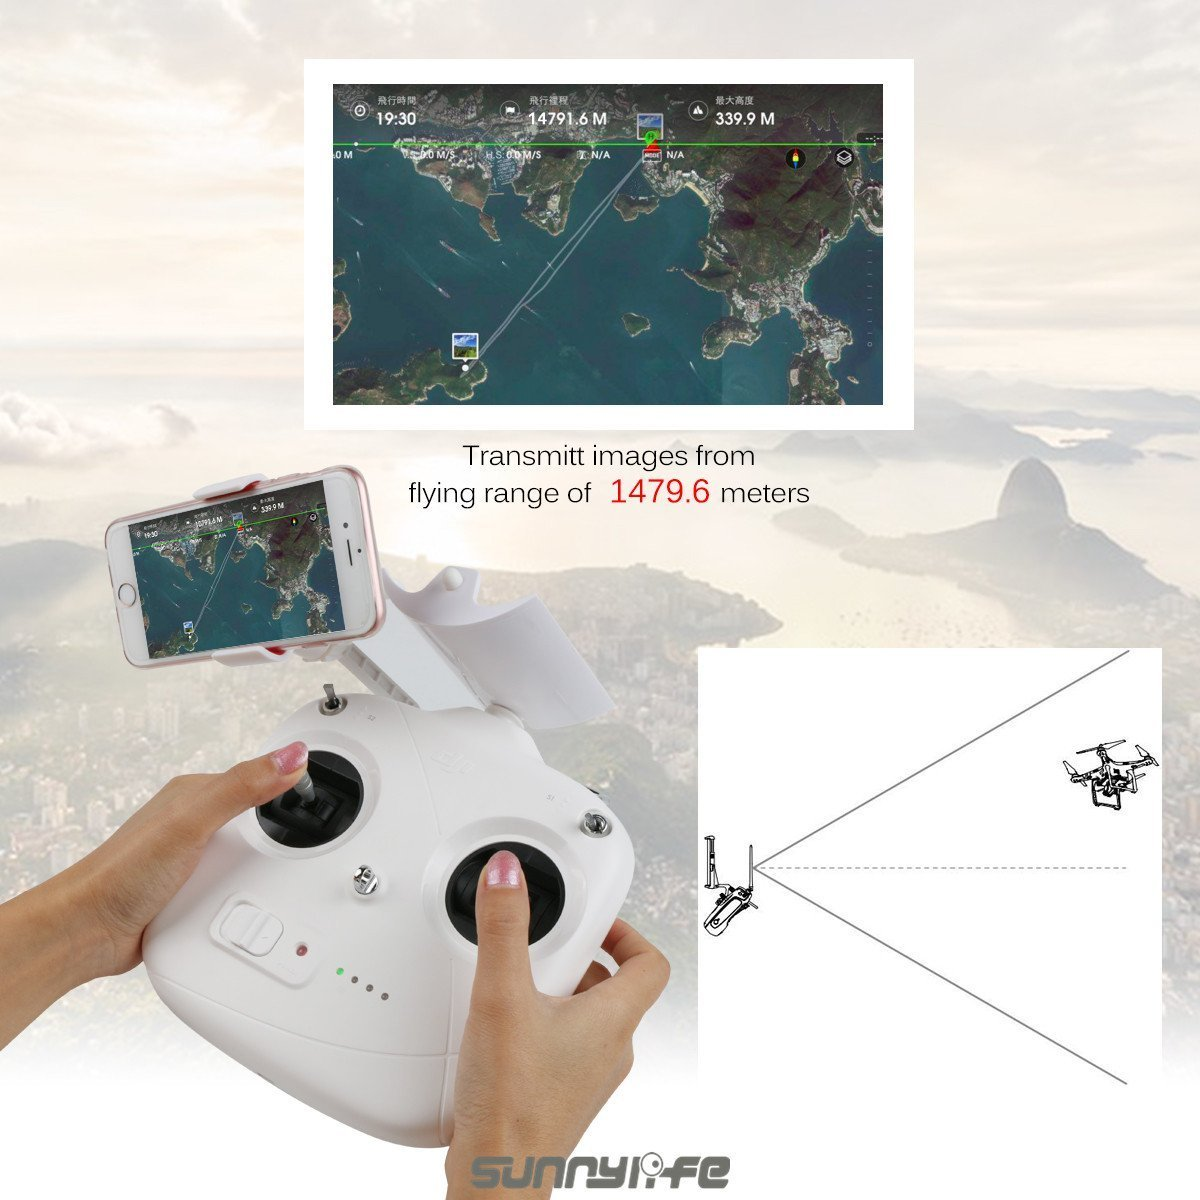 Drone Fans Remote Control Phantom 3 Standard Range Antenna Signal Booster Aksesoris Dji Extender Parabolic For And 2 Camera